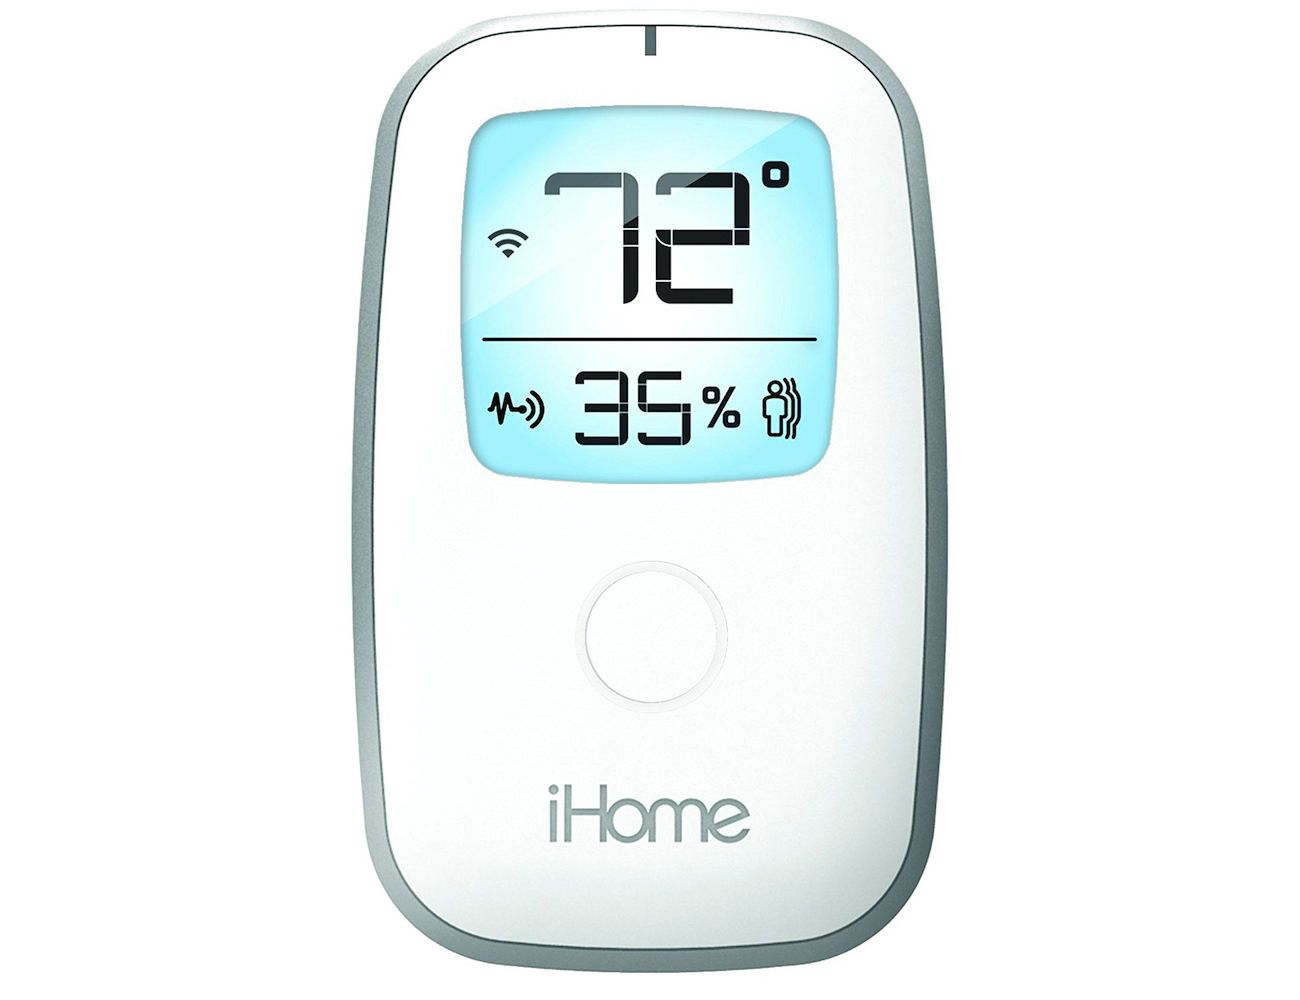 iHome iSS50 Smart Home Monitor